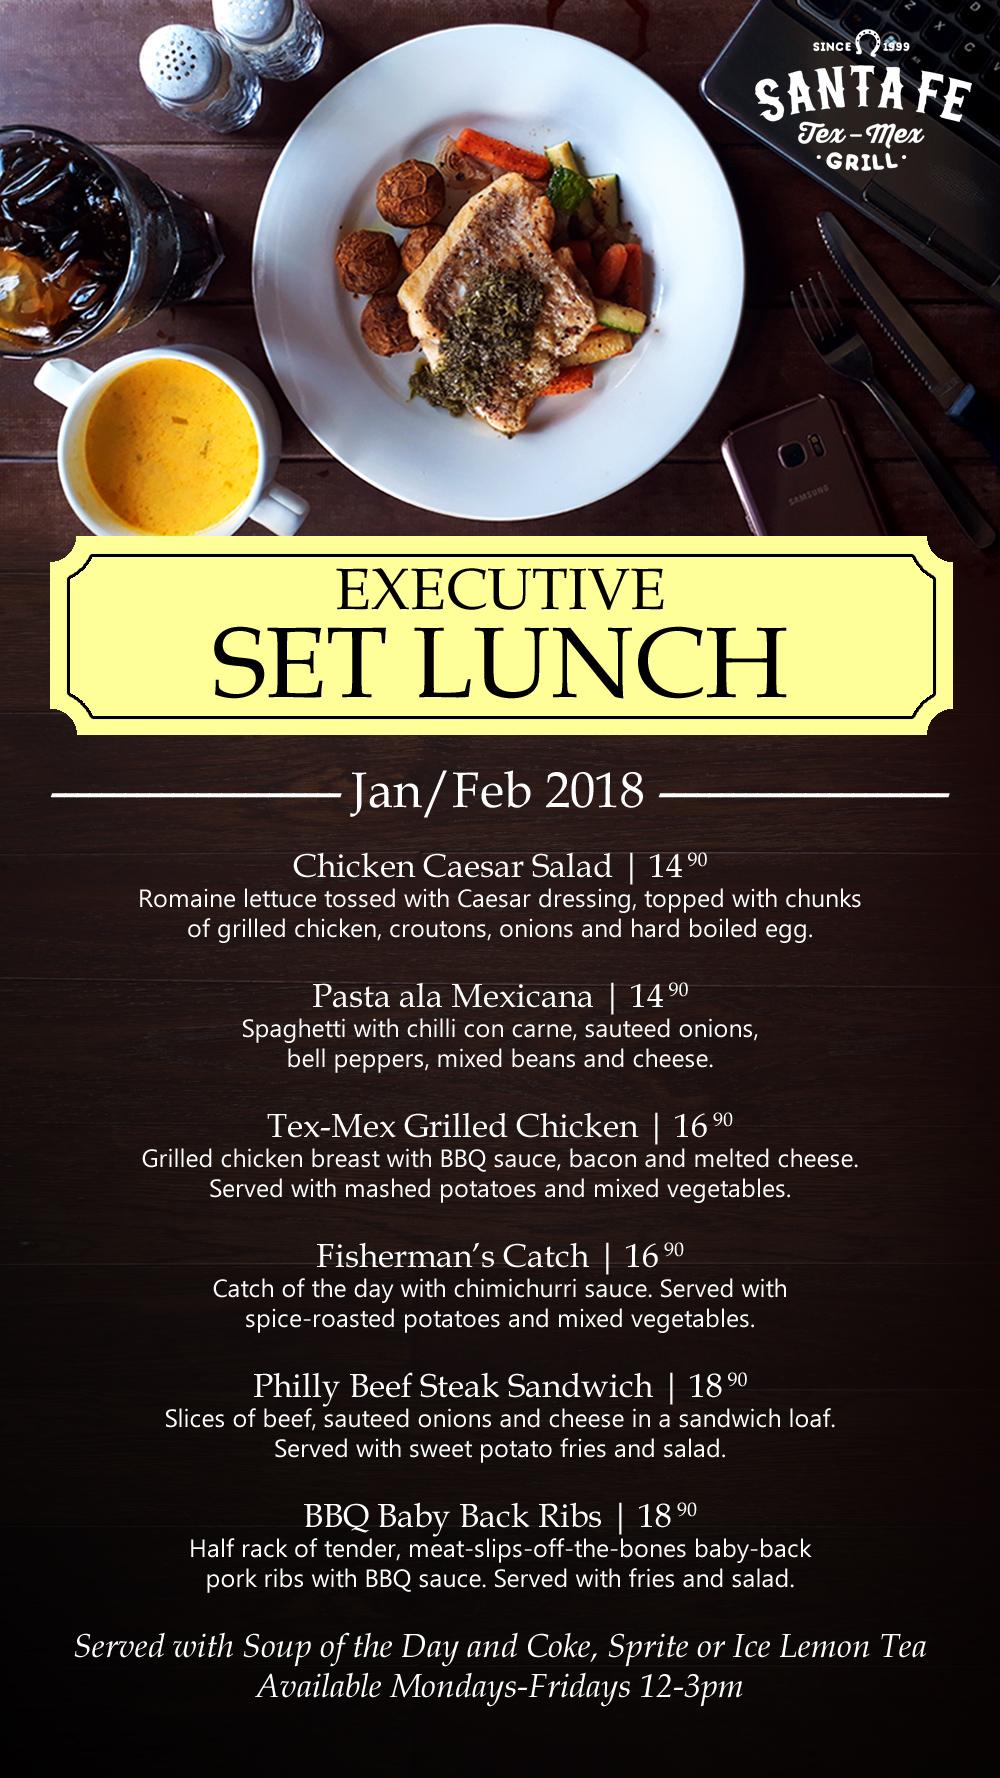 Santa Fe Executive Set Lunch